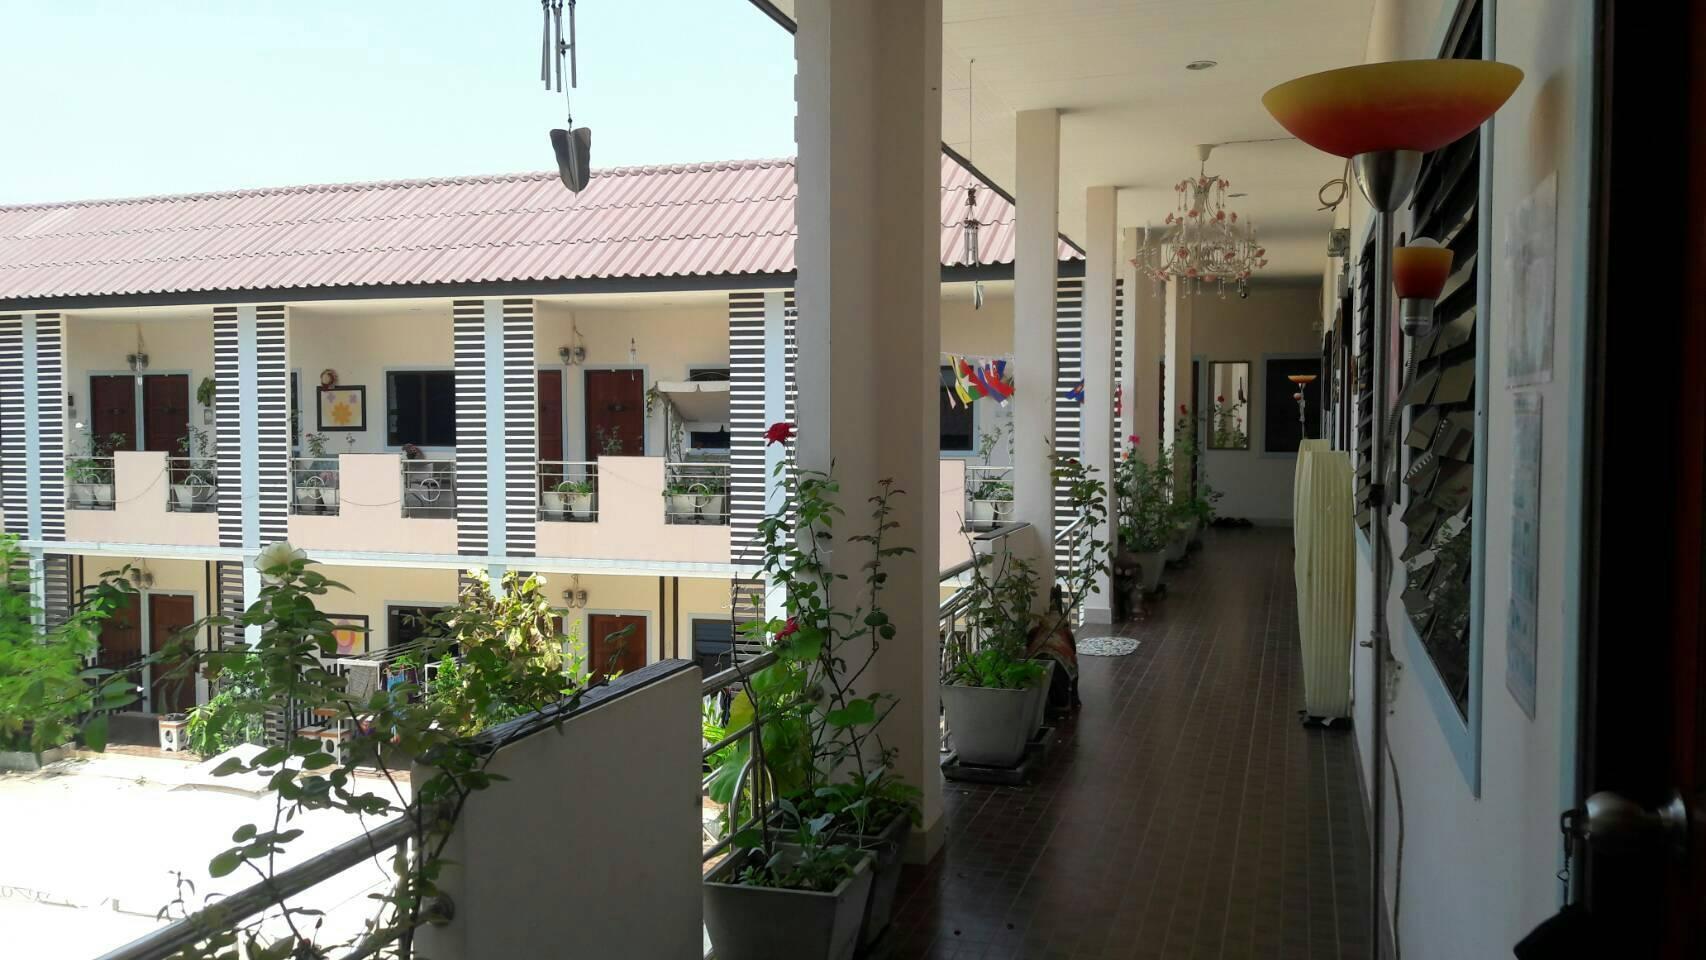 Ban Suan Kularb Surat Thani AirCon Room 3 สตูดิโอ อพาร์ตเมนต์ 1 ห้องน้ำส่วนตัว ขนาด 30 ตร.ม. – ซิตี้เซ็นเตอร์